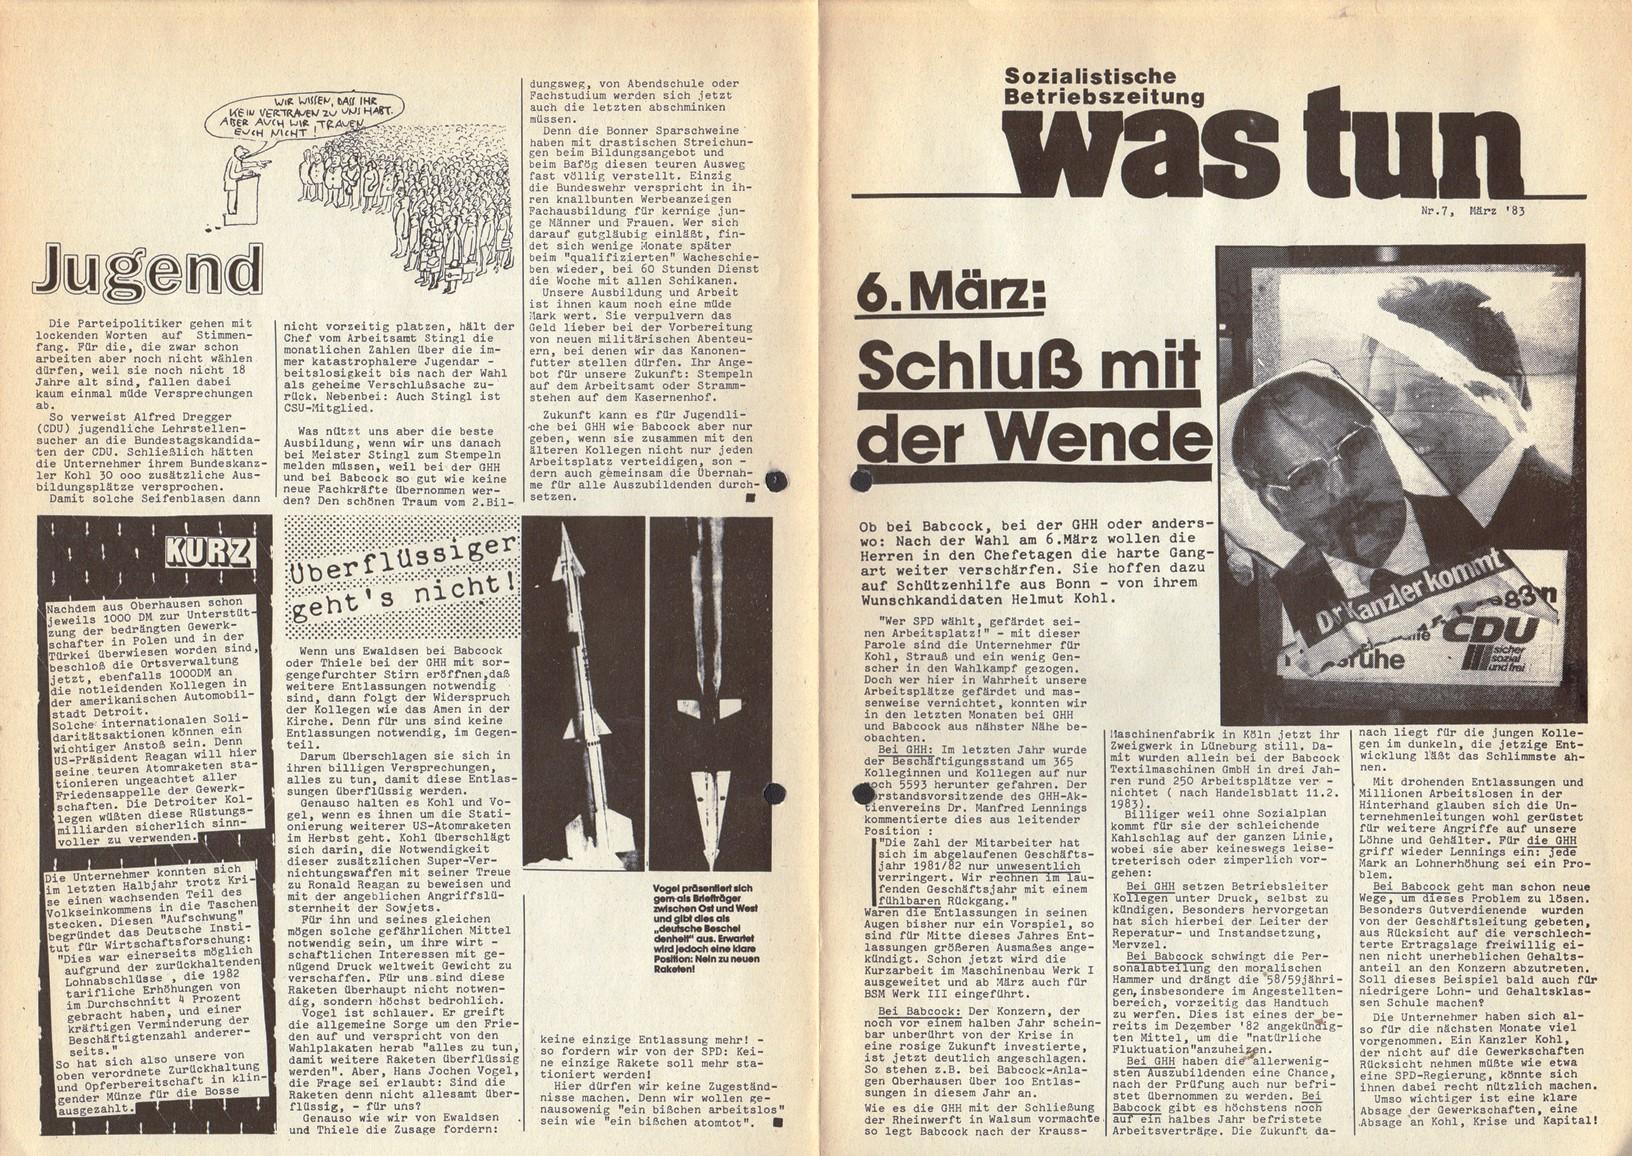 Oberhausen_GIM_Was_tun_bei_Babcock_19830300_01